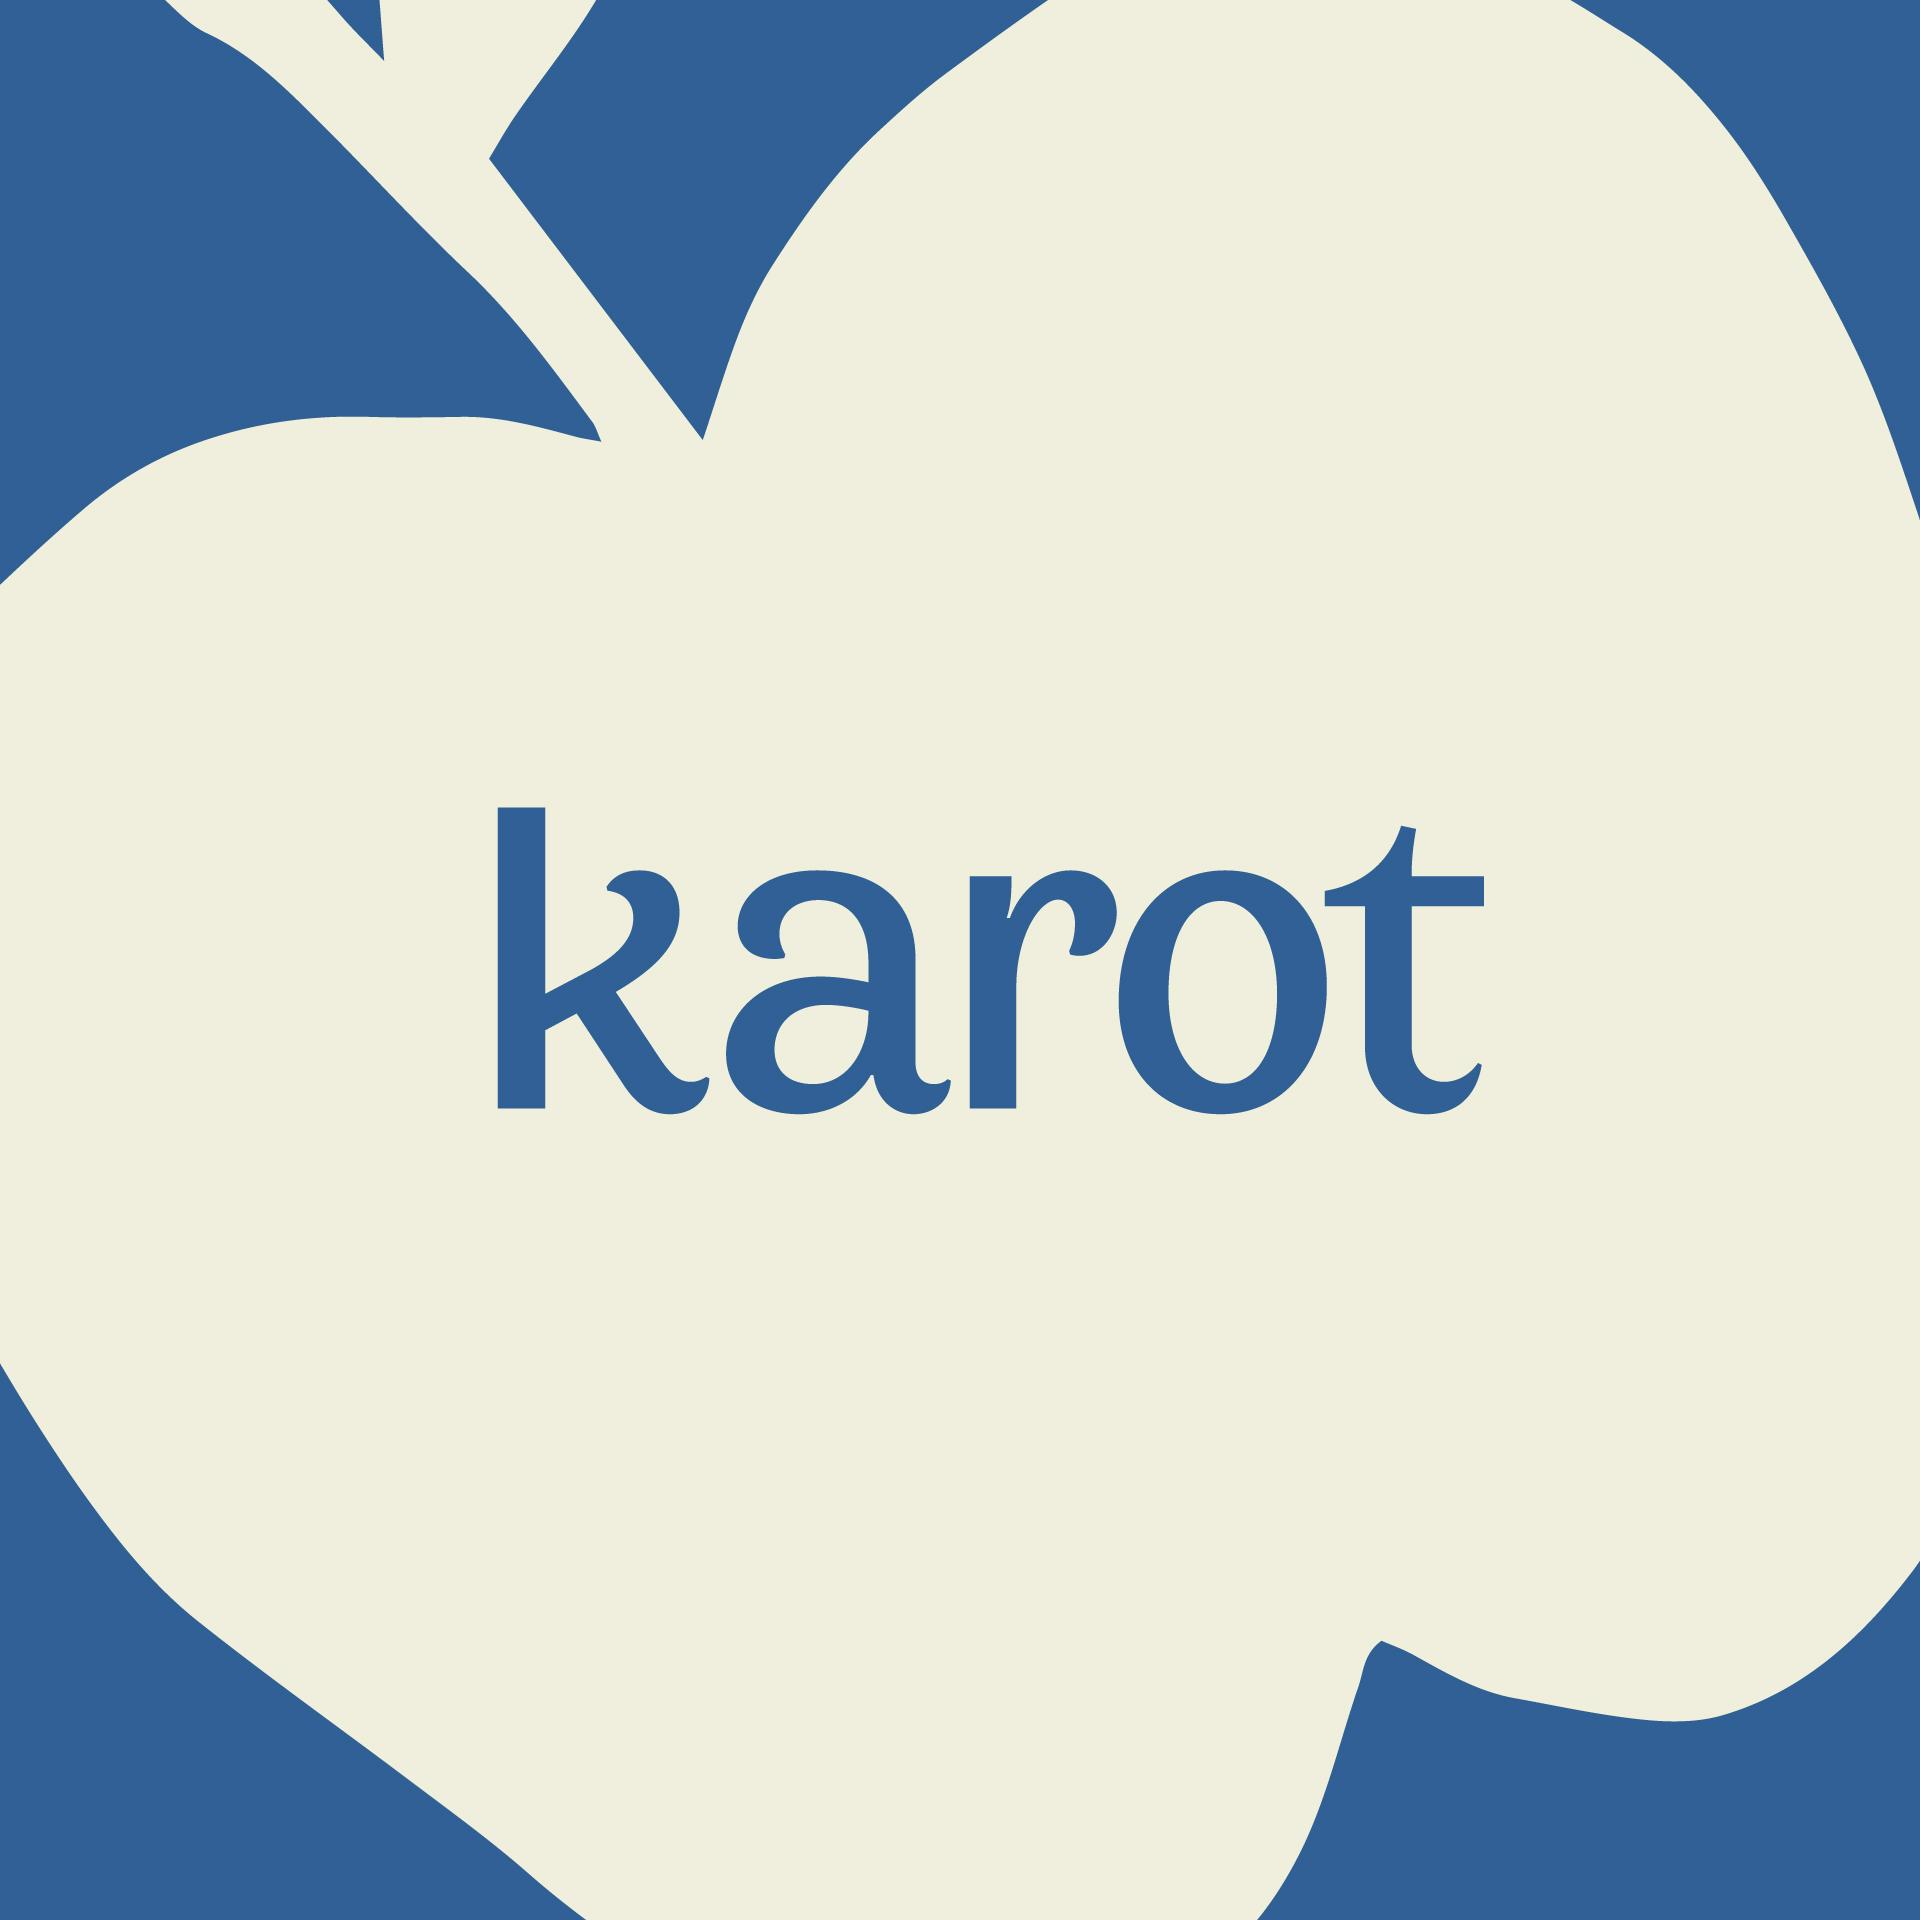 Karot-Brand-Identity-Design-9